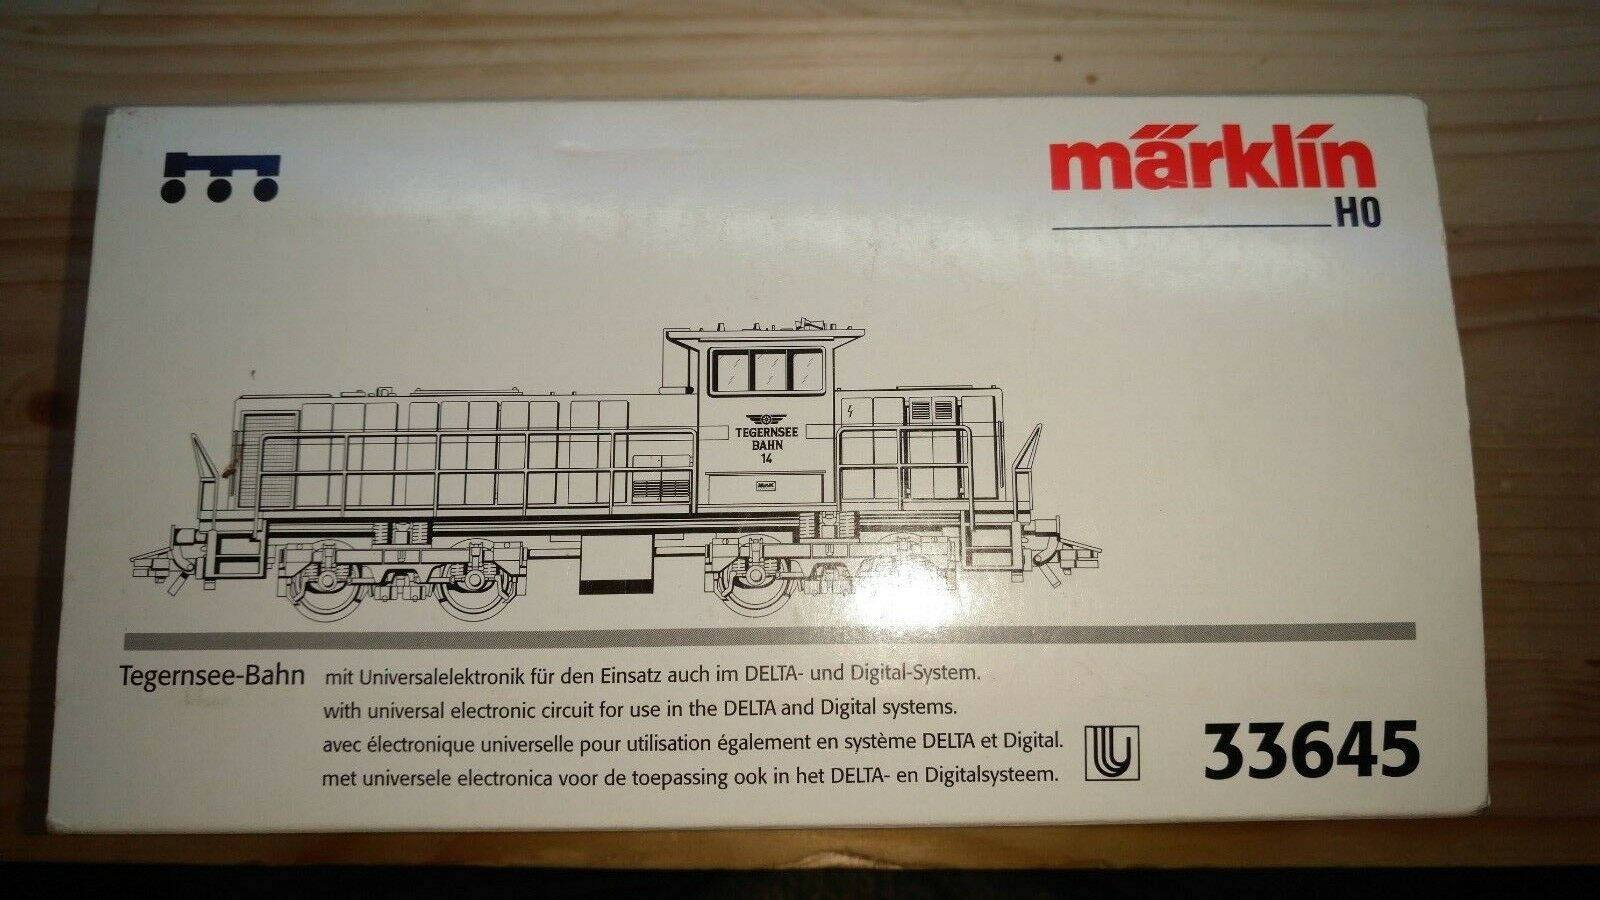 MÄRKLIN 33645 Mak Diesel G1204 Tegernsee-Bahn #14 Ep IV ++ Limited Serie